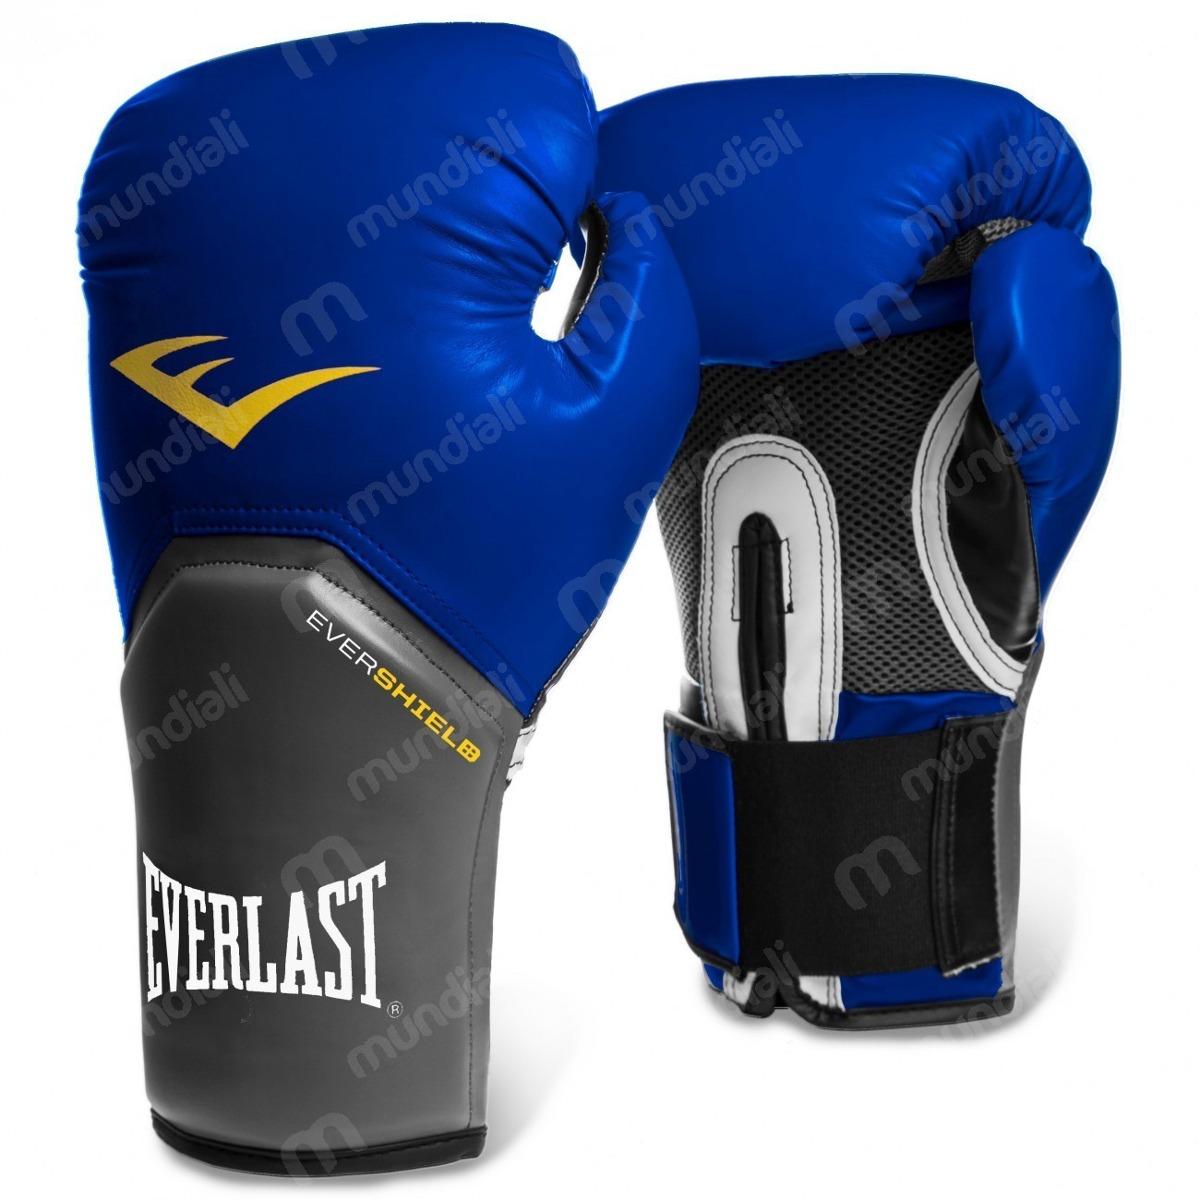 7984ad641 luva boxe everlast pro style elite training 12 oz azul. Carregando zoom.